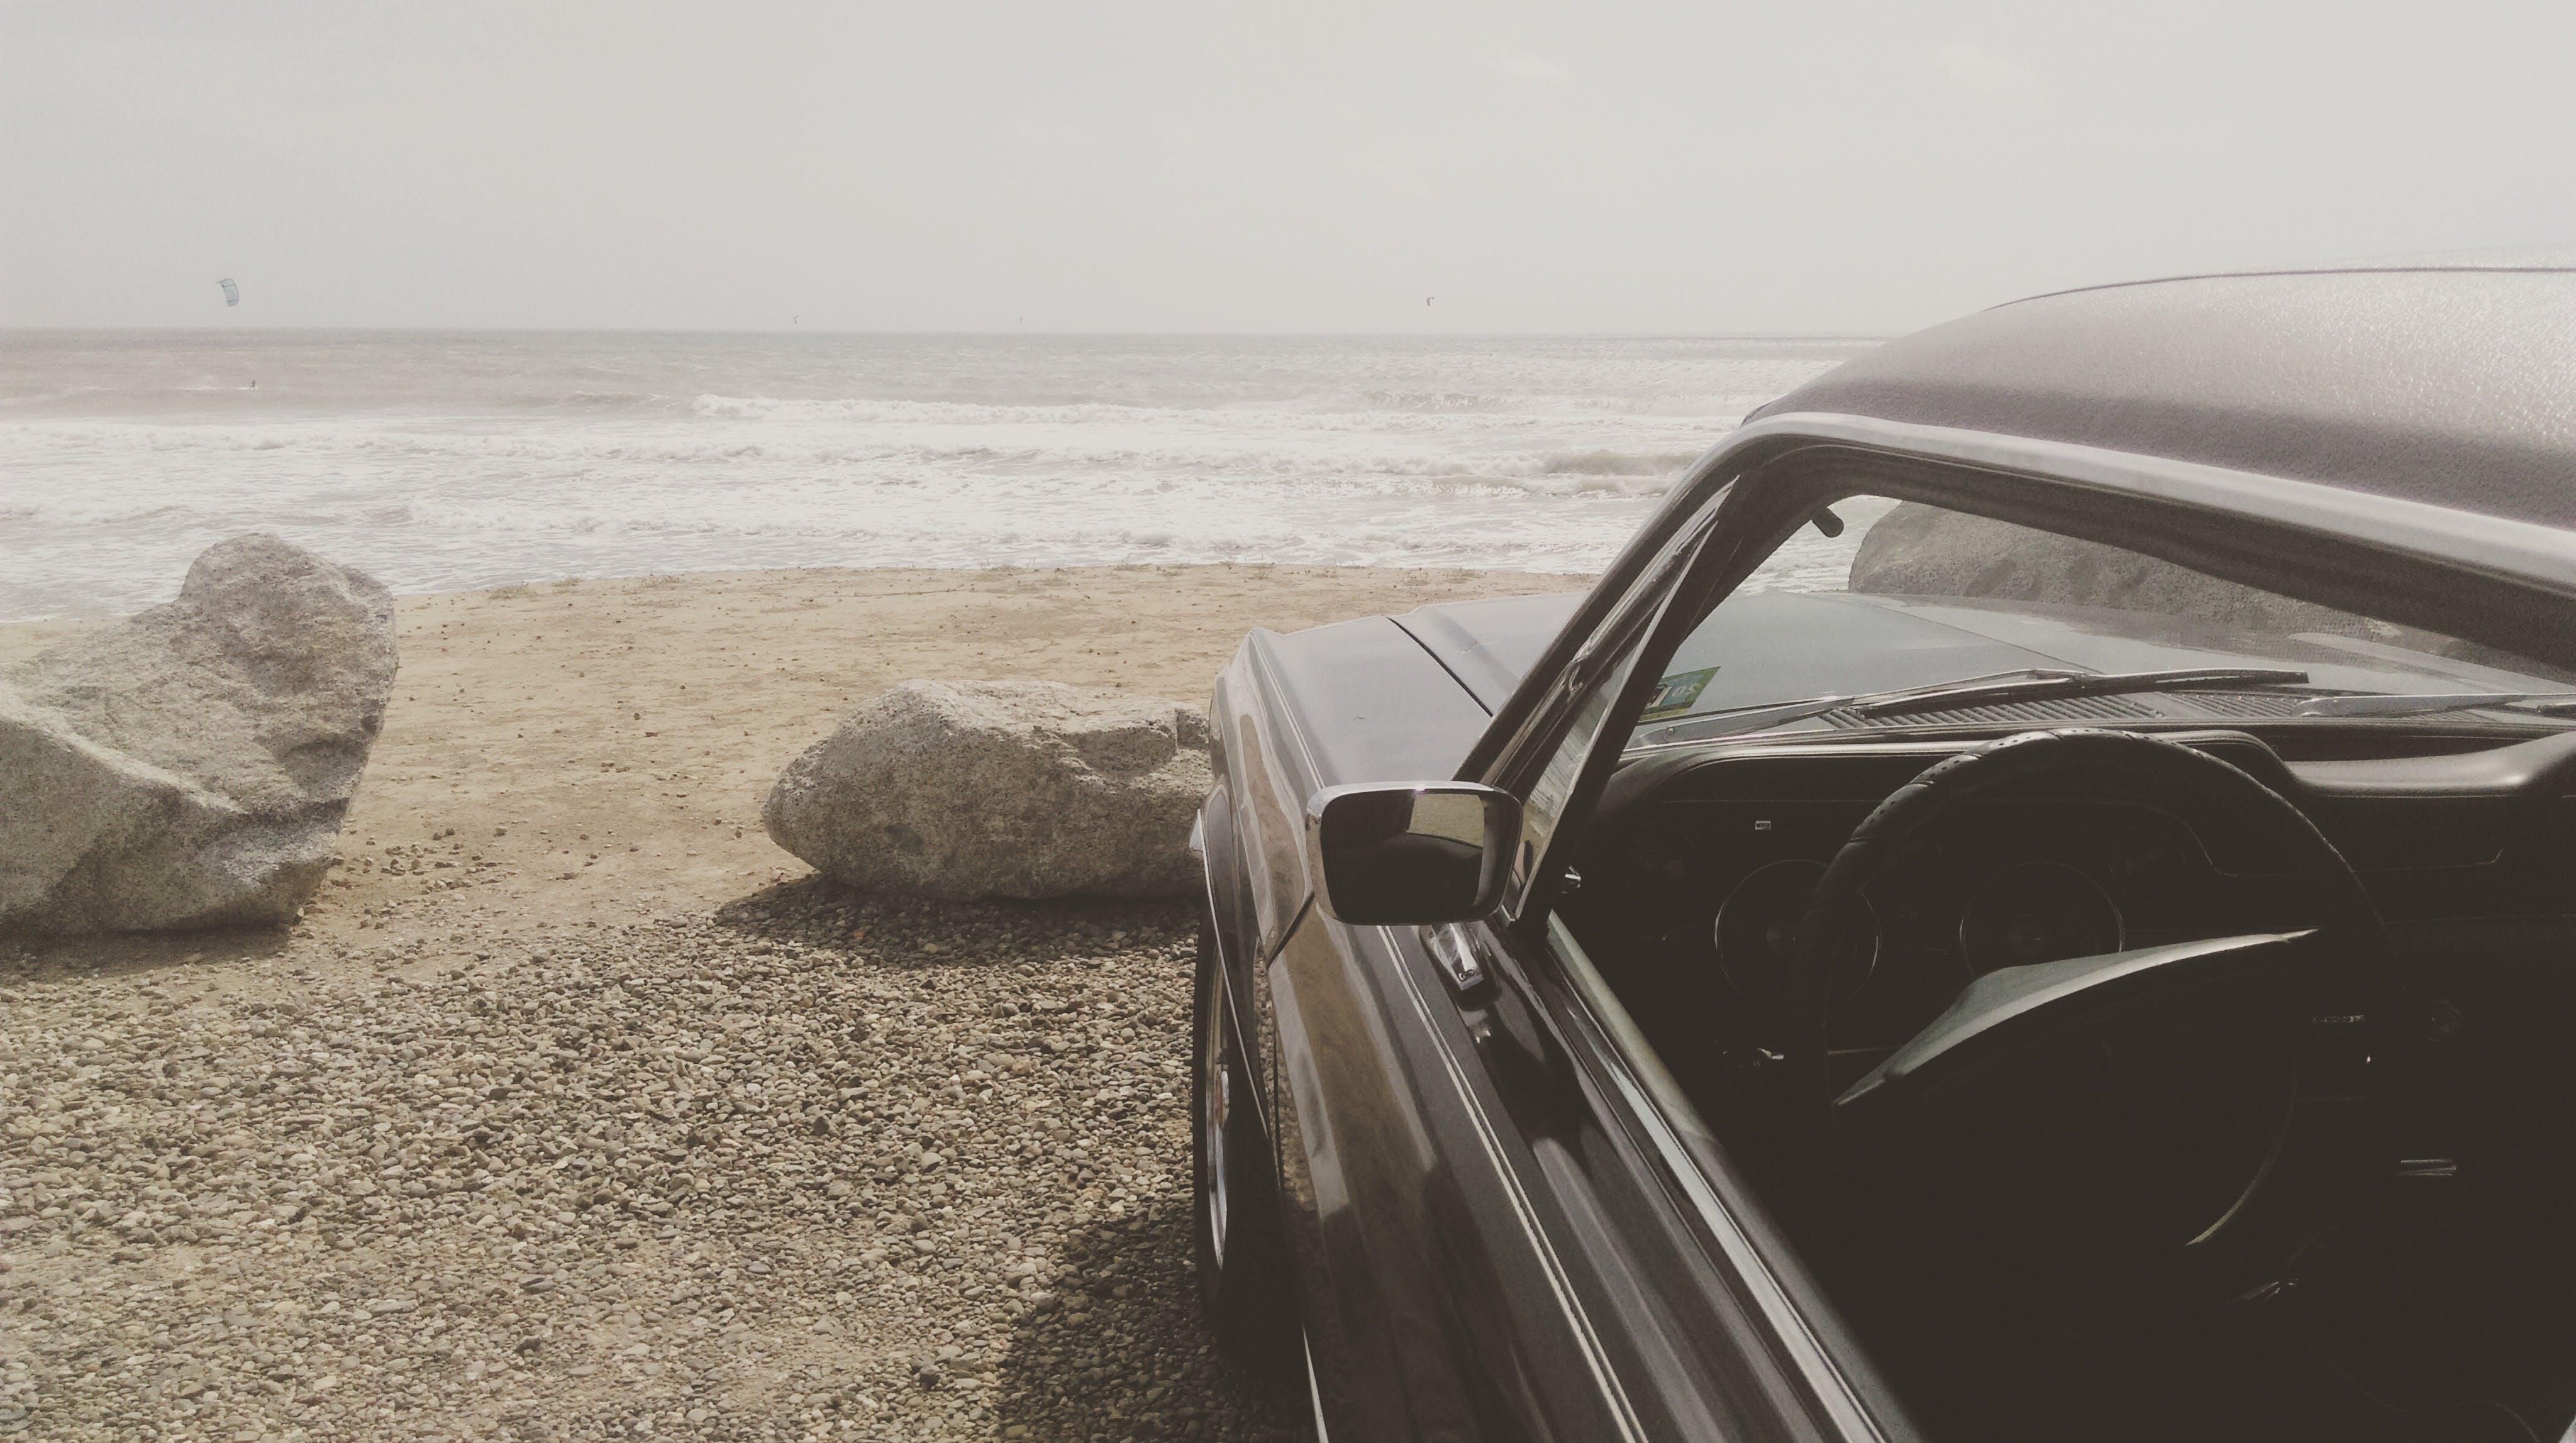 Black Car Parked on the Seashore